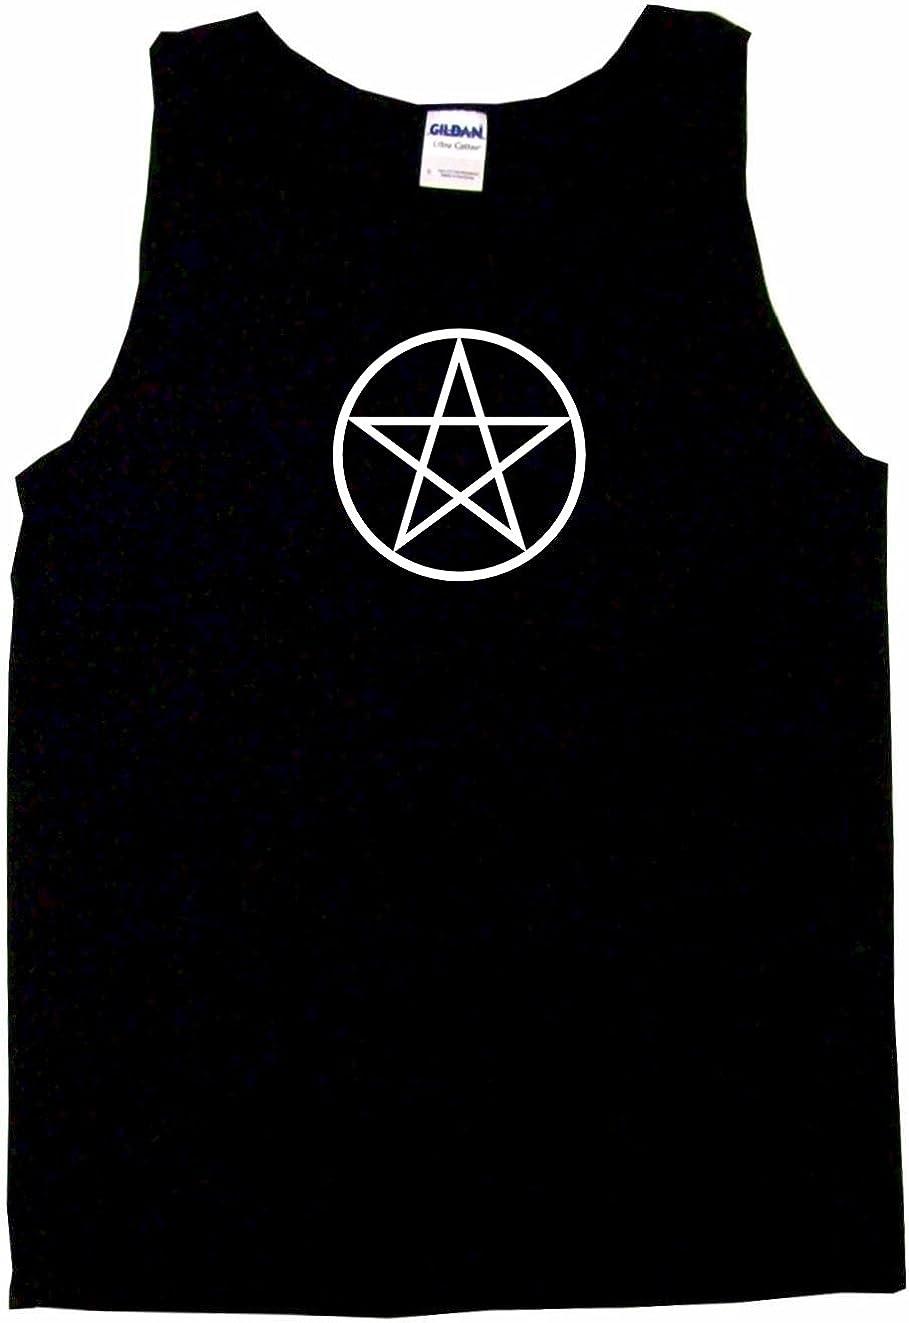 99 Volts Wicca Pentagram Circle Logo Men's Tee Shirt